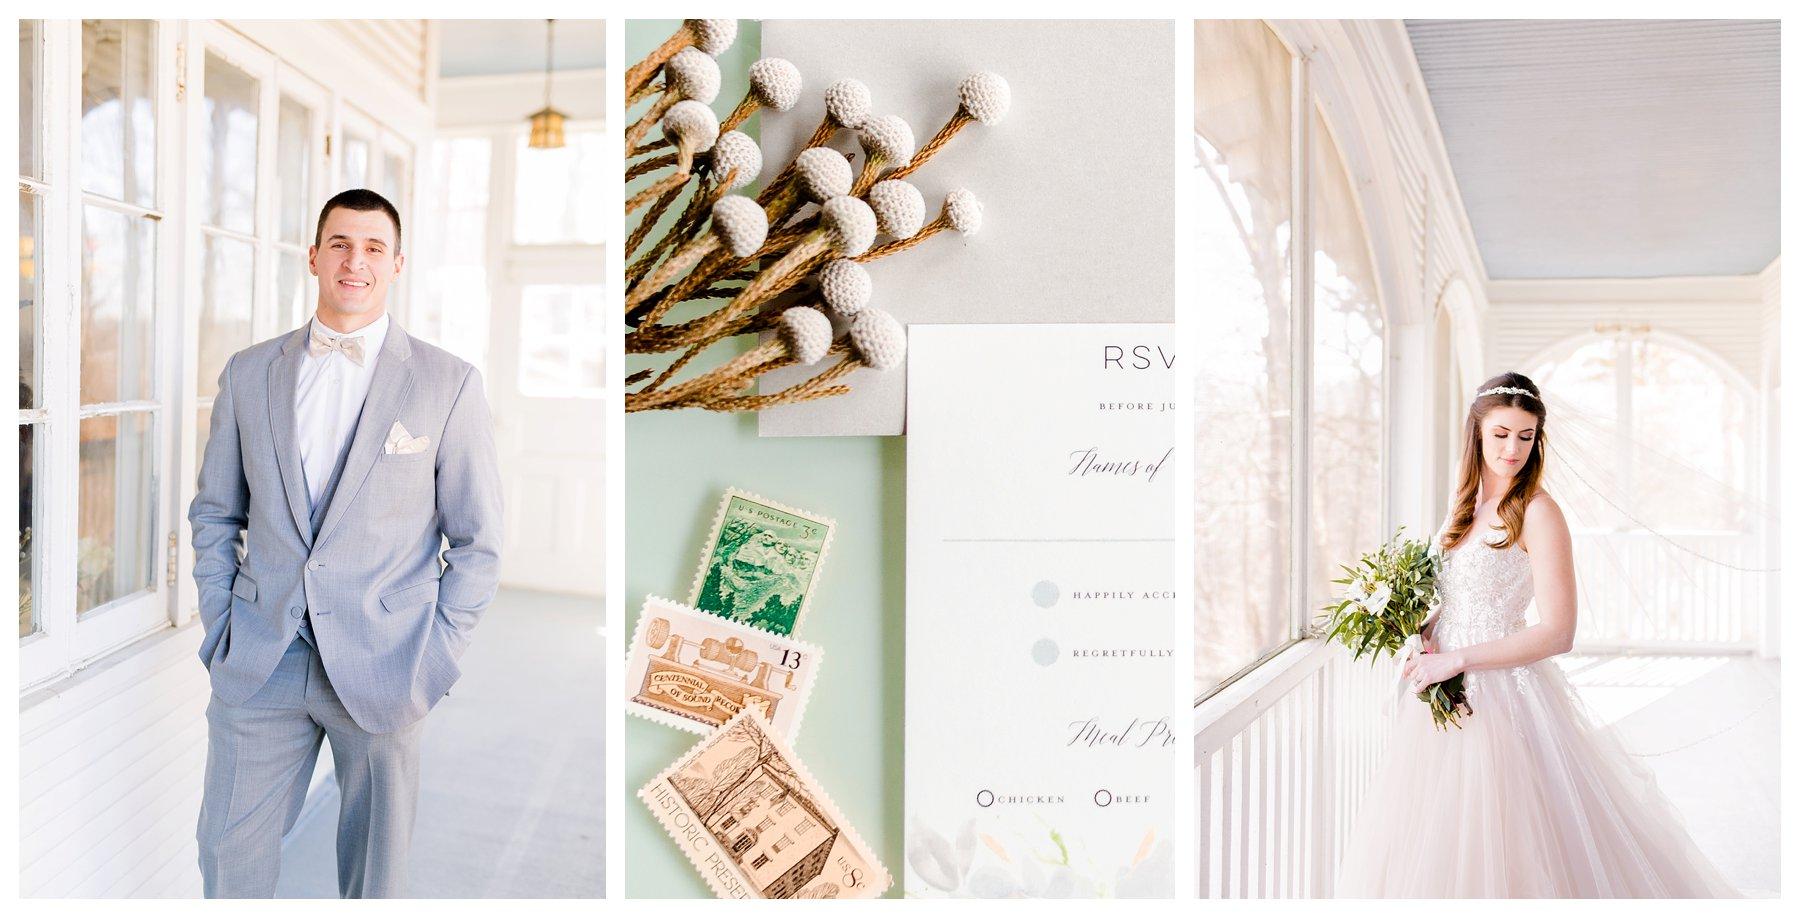 photographer_wedding_saint_louis_Kansas_City_Photography_Videography_workshop_training_styled_engagement_Lake_Ozark_KC_MO_STL_Rolla_Hermann_Saint_James_0406.jpg